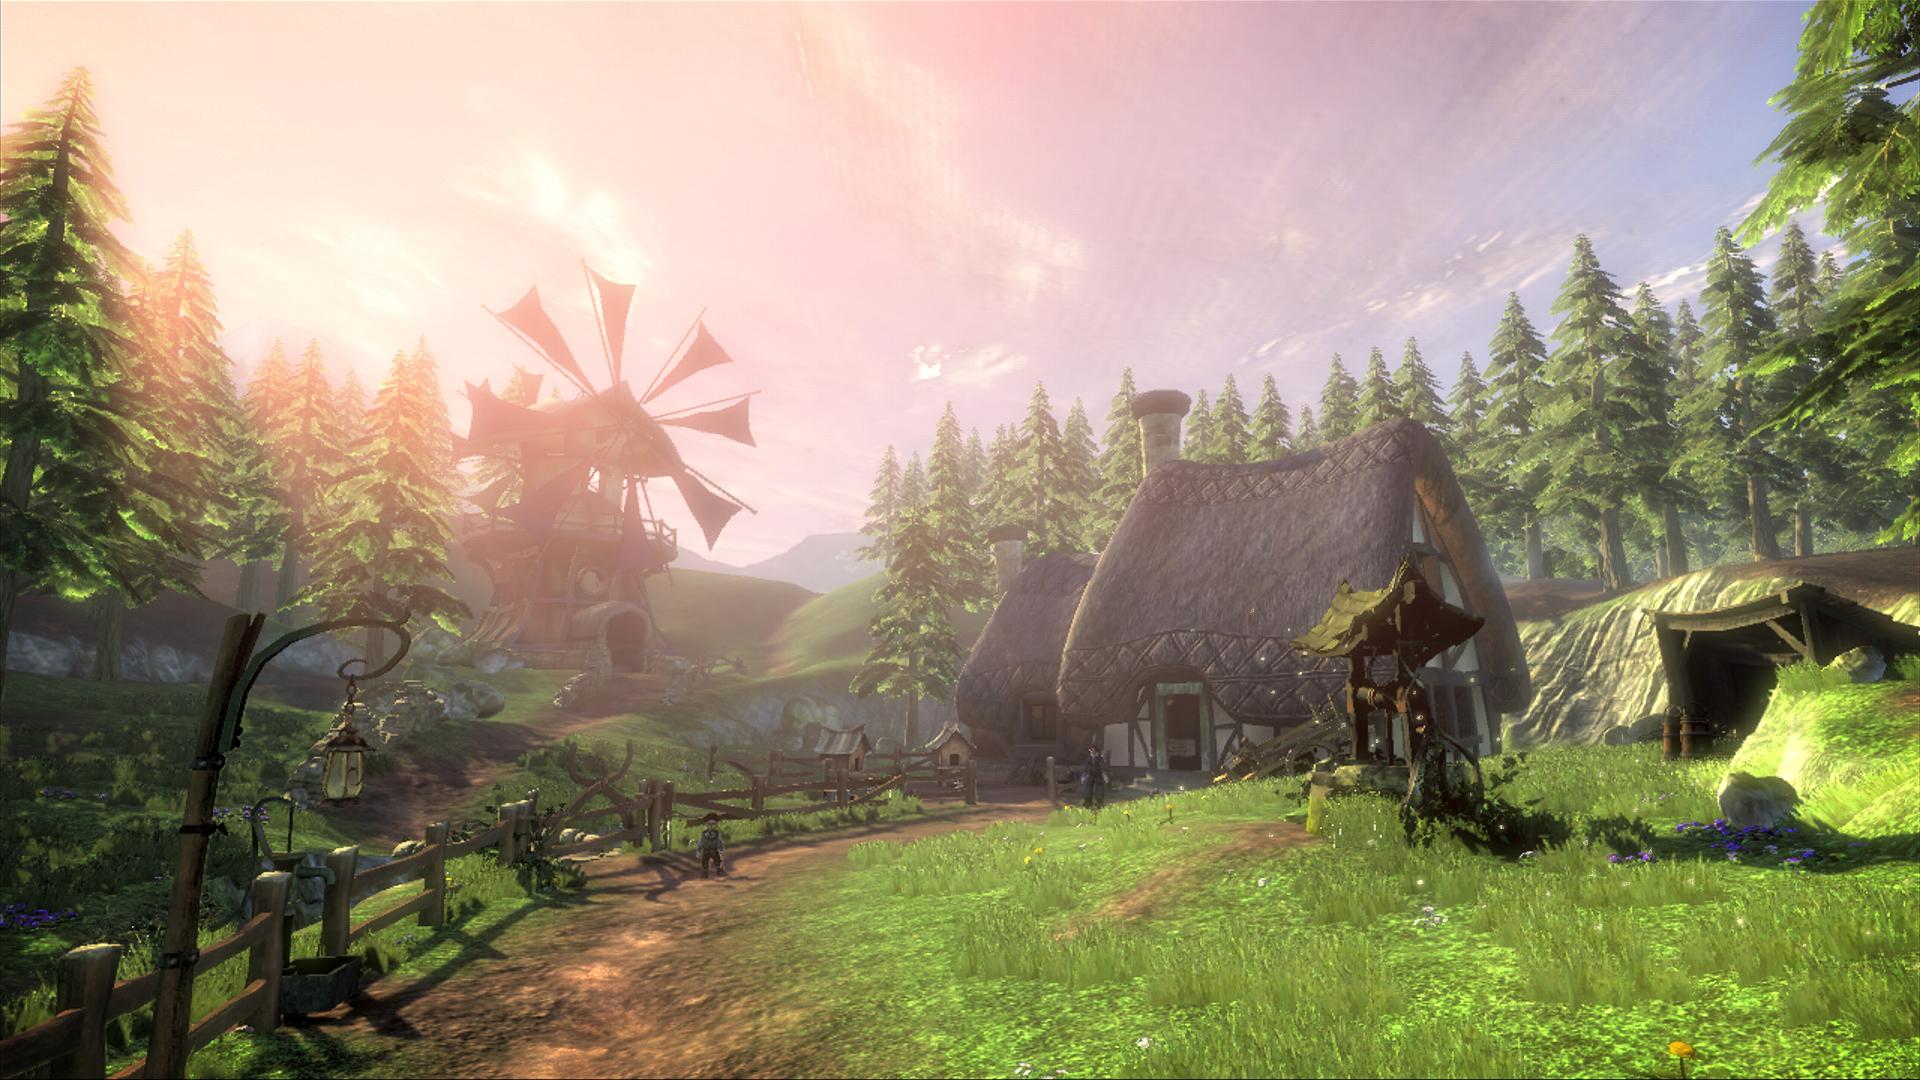 Game landscape top 10   Games Landscape HD Wallpaper